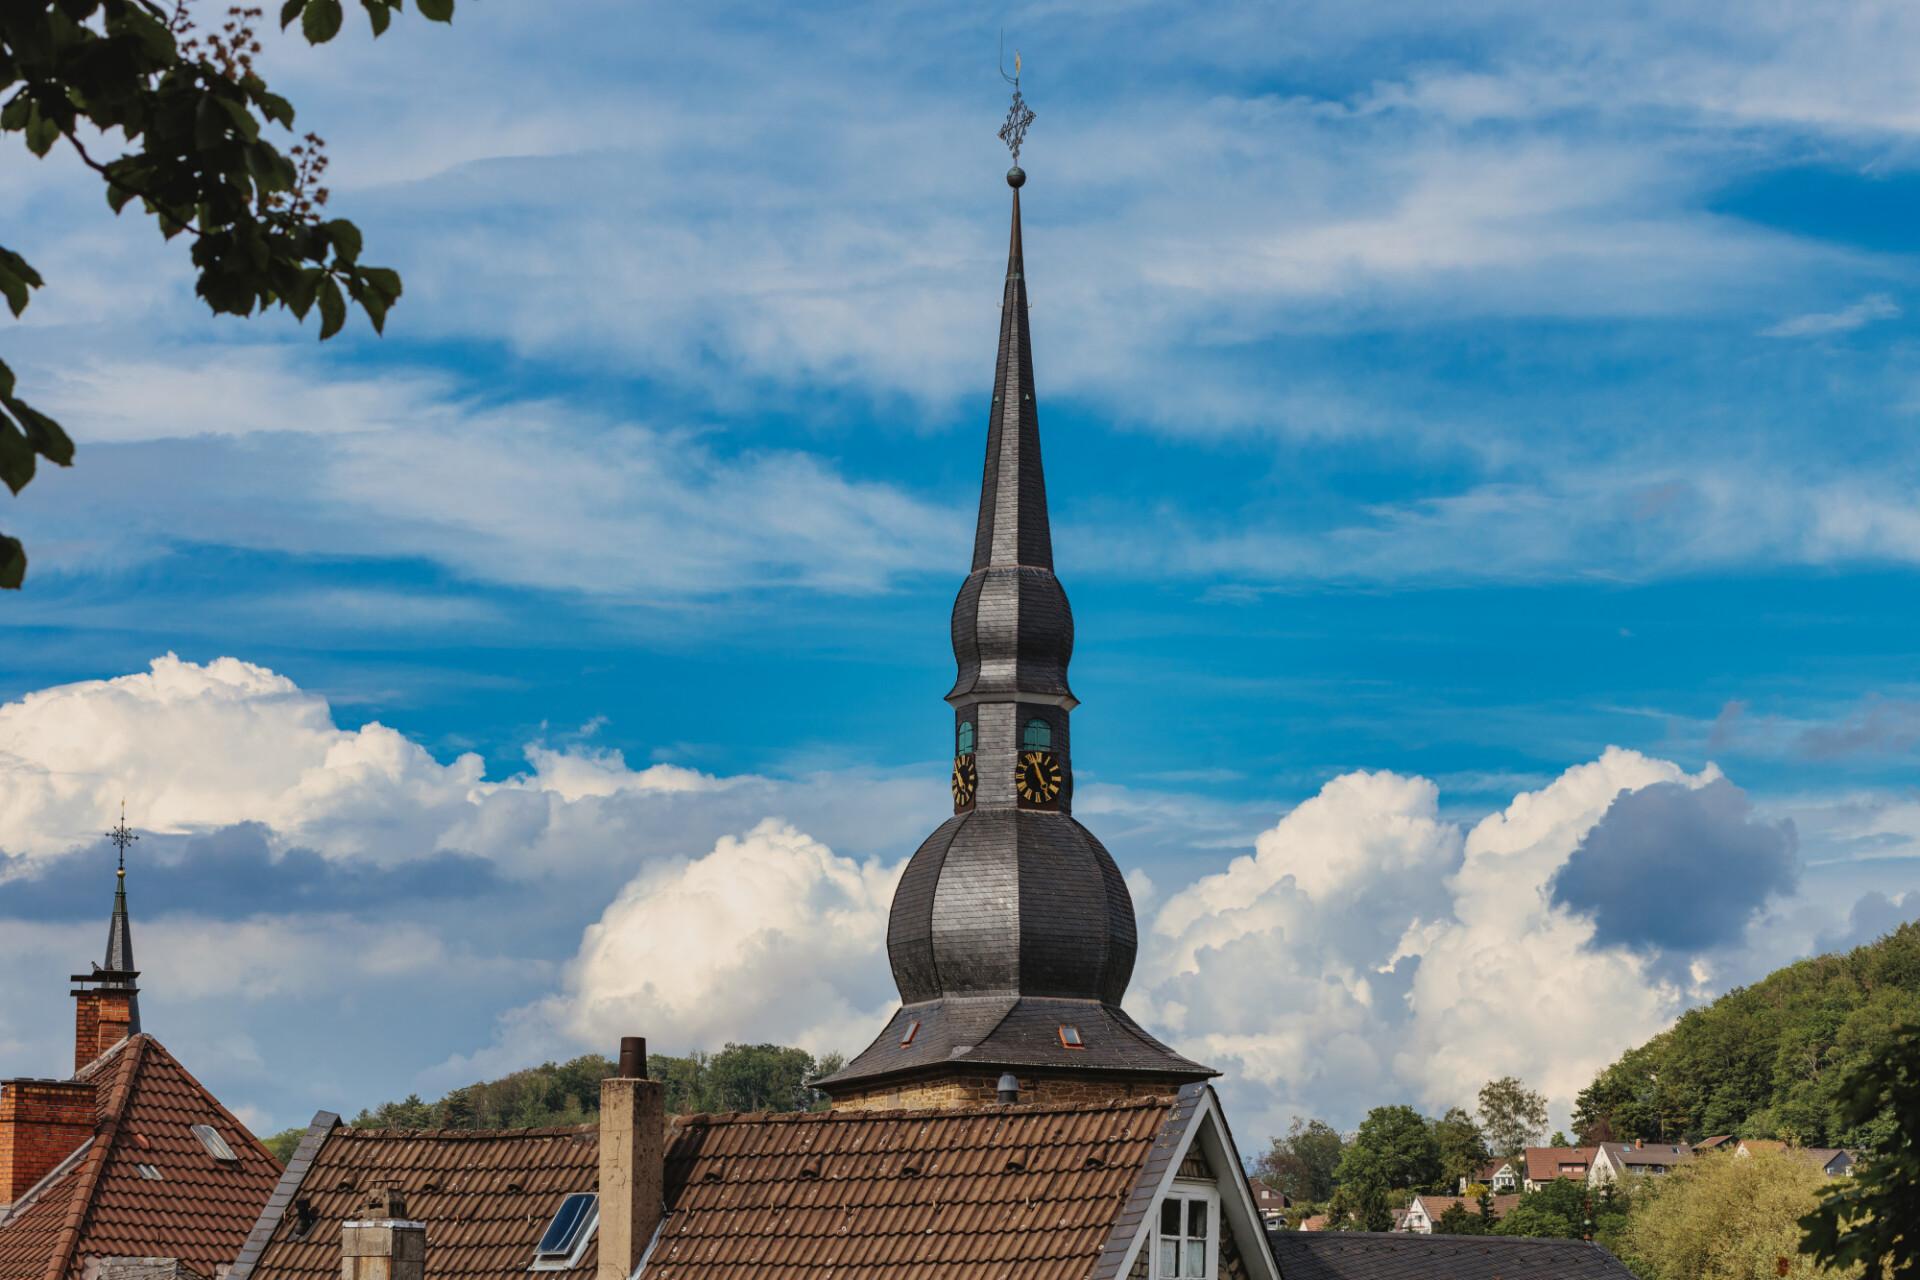 Velbert Langenberg Old Town